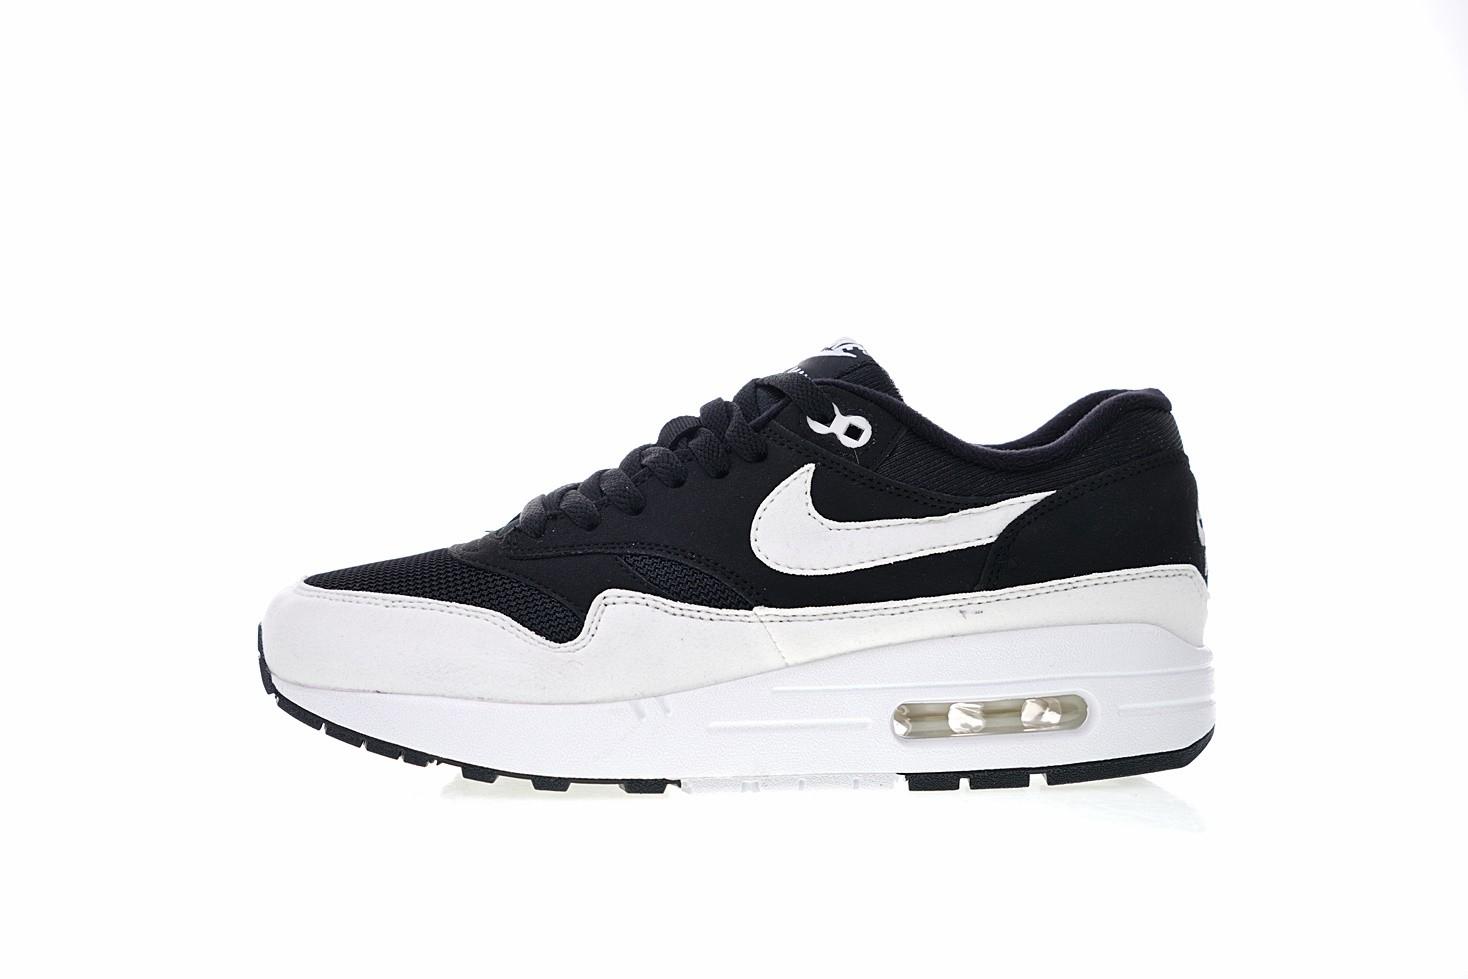 8e8317830f7 Prev Nike Air Max 1 Black White Sneakers University Classic 319986-034